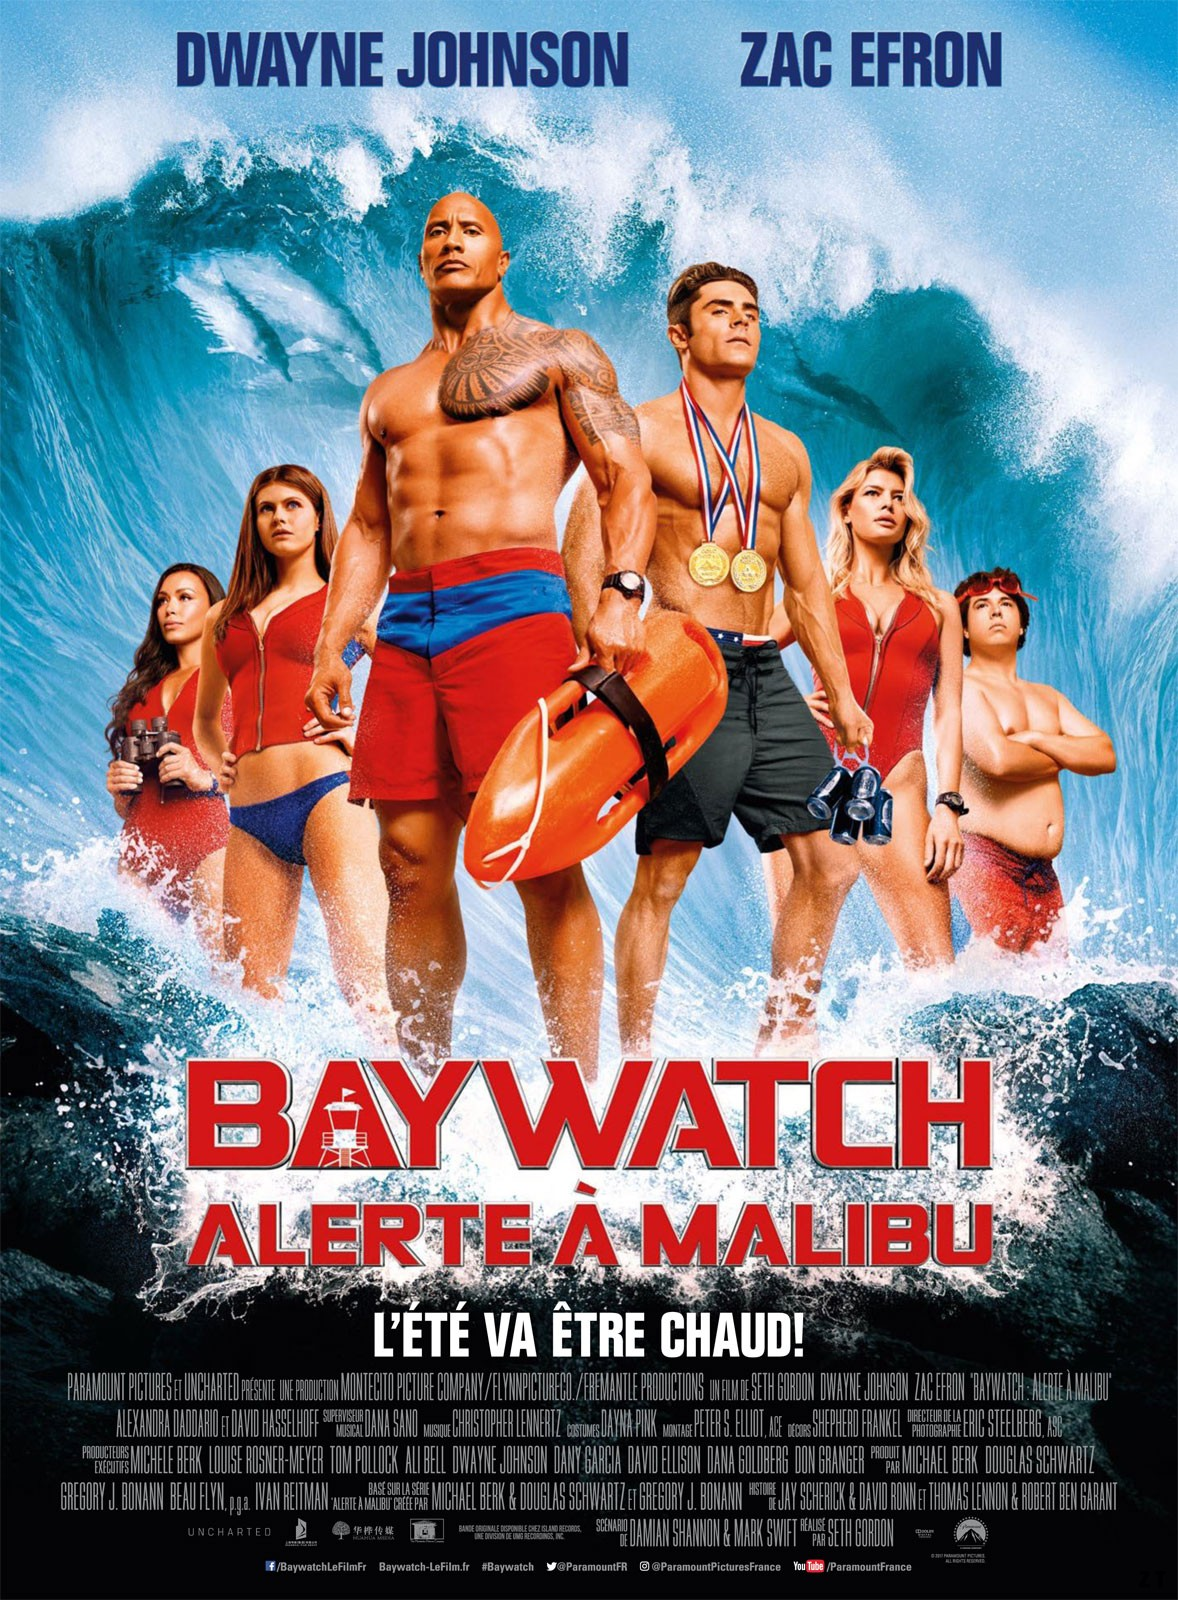 Baywatch - Alerte à Malibu FRENCH DVDRIP 2017